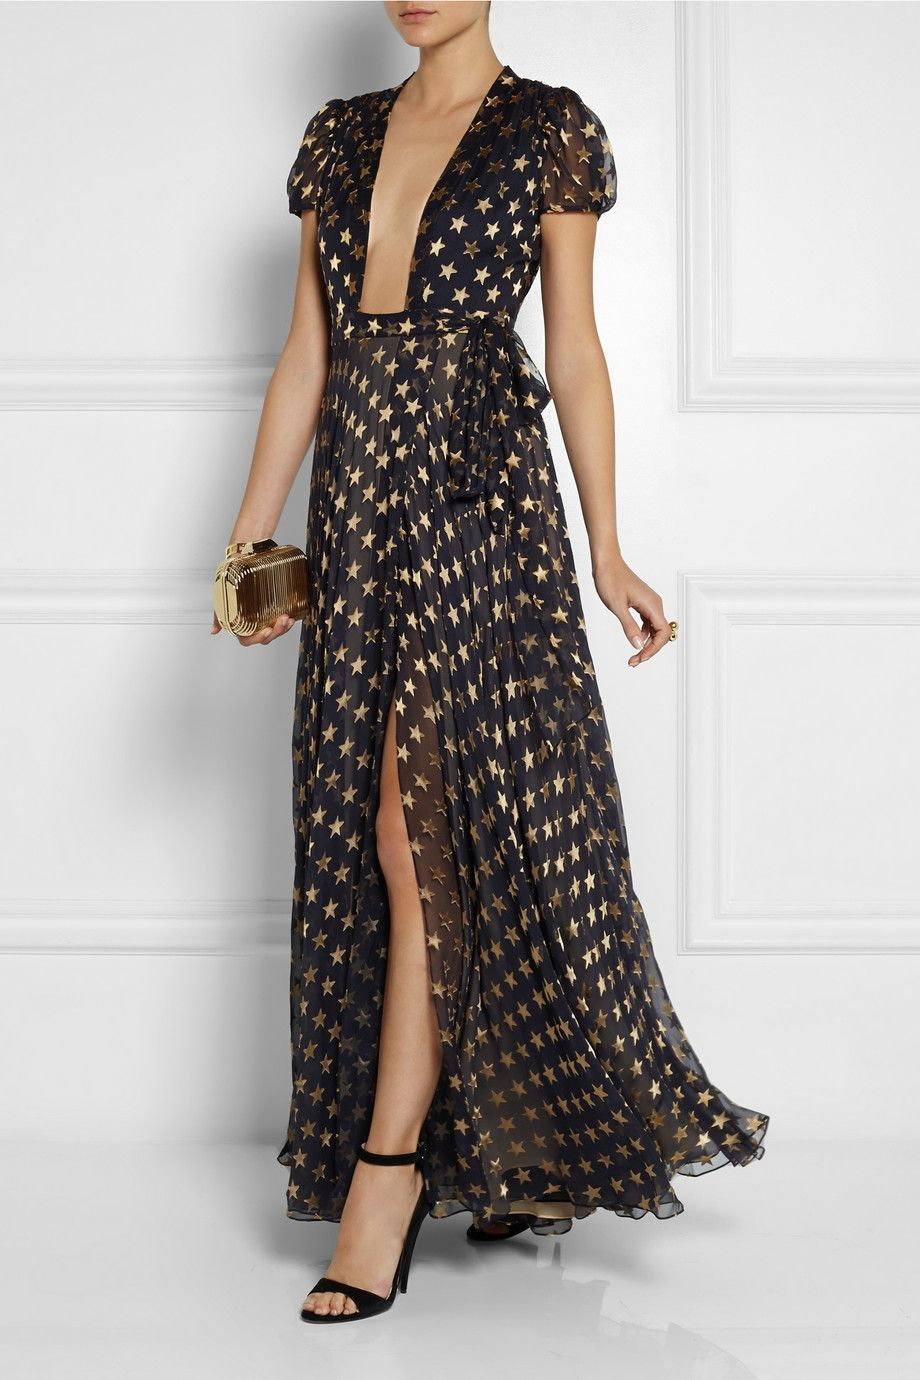 Dvf Oversized Black Wrap Dress Google Search Diane Von Furstenberg Wrap Dress Fancy Dresses Long Diane Von Furstenberg [ 1380 x 920 Pixel ]